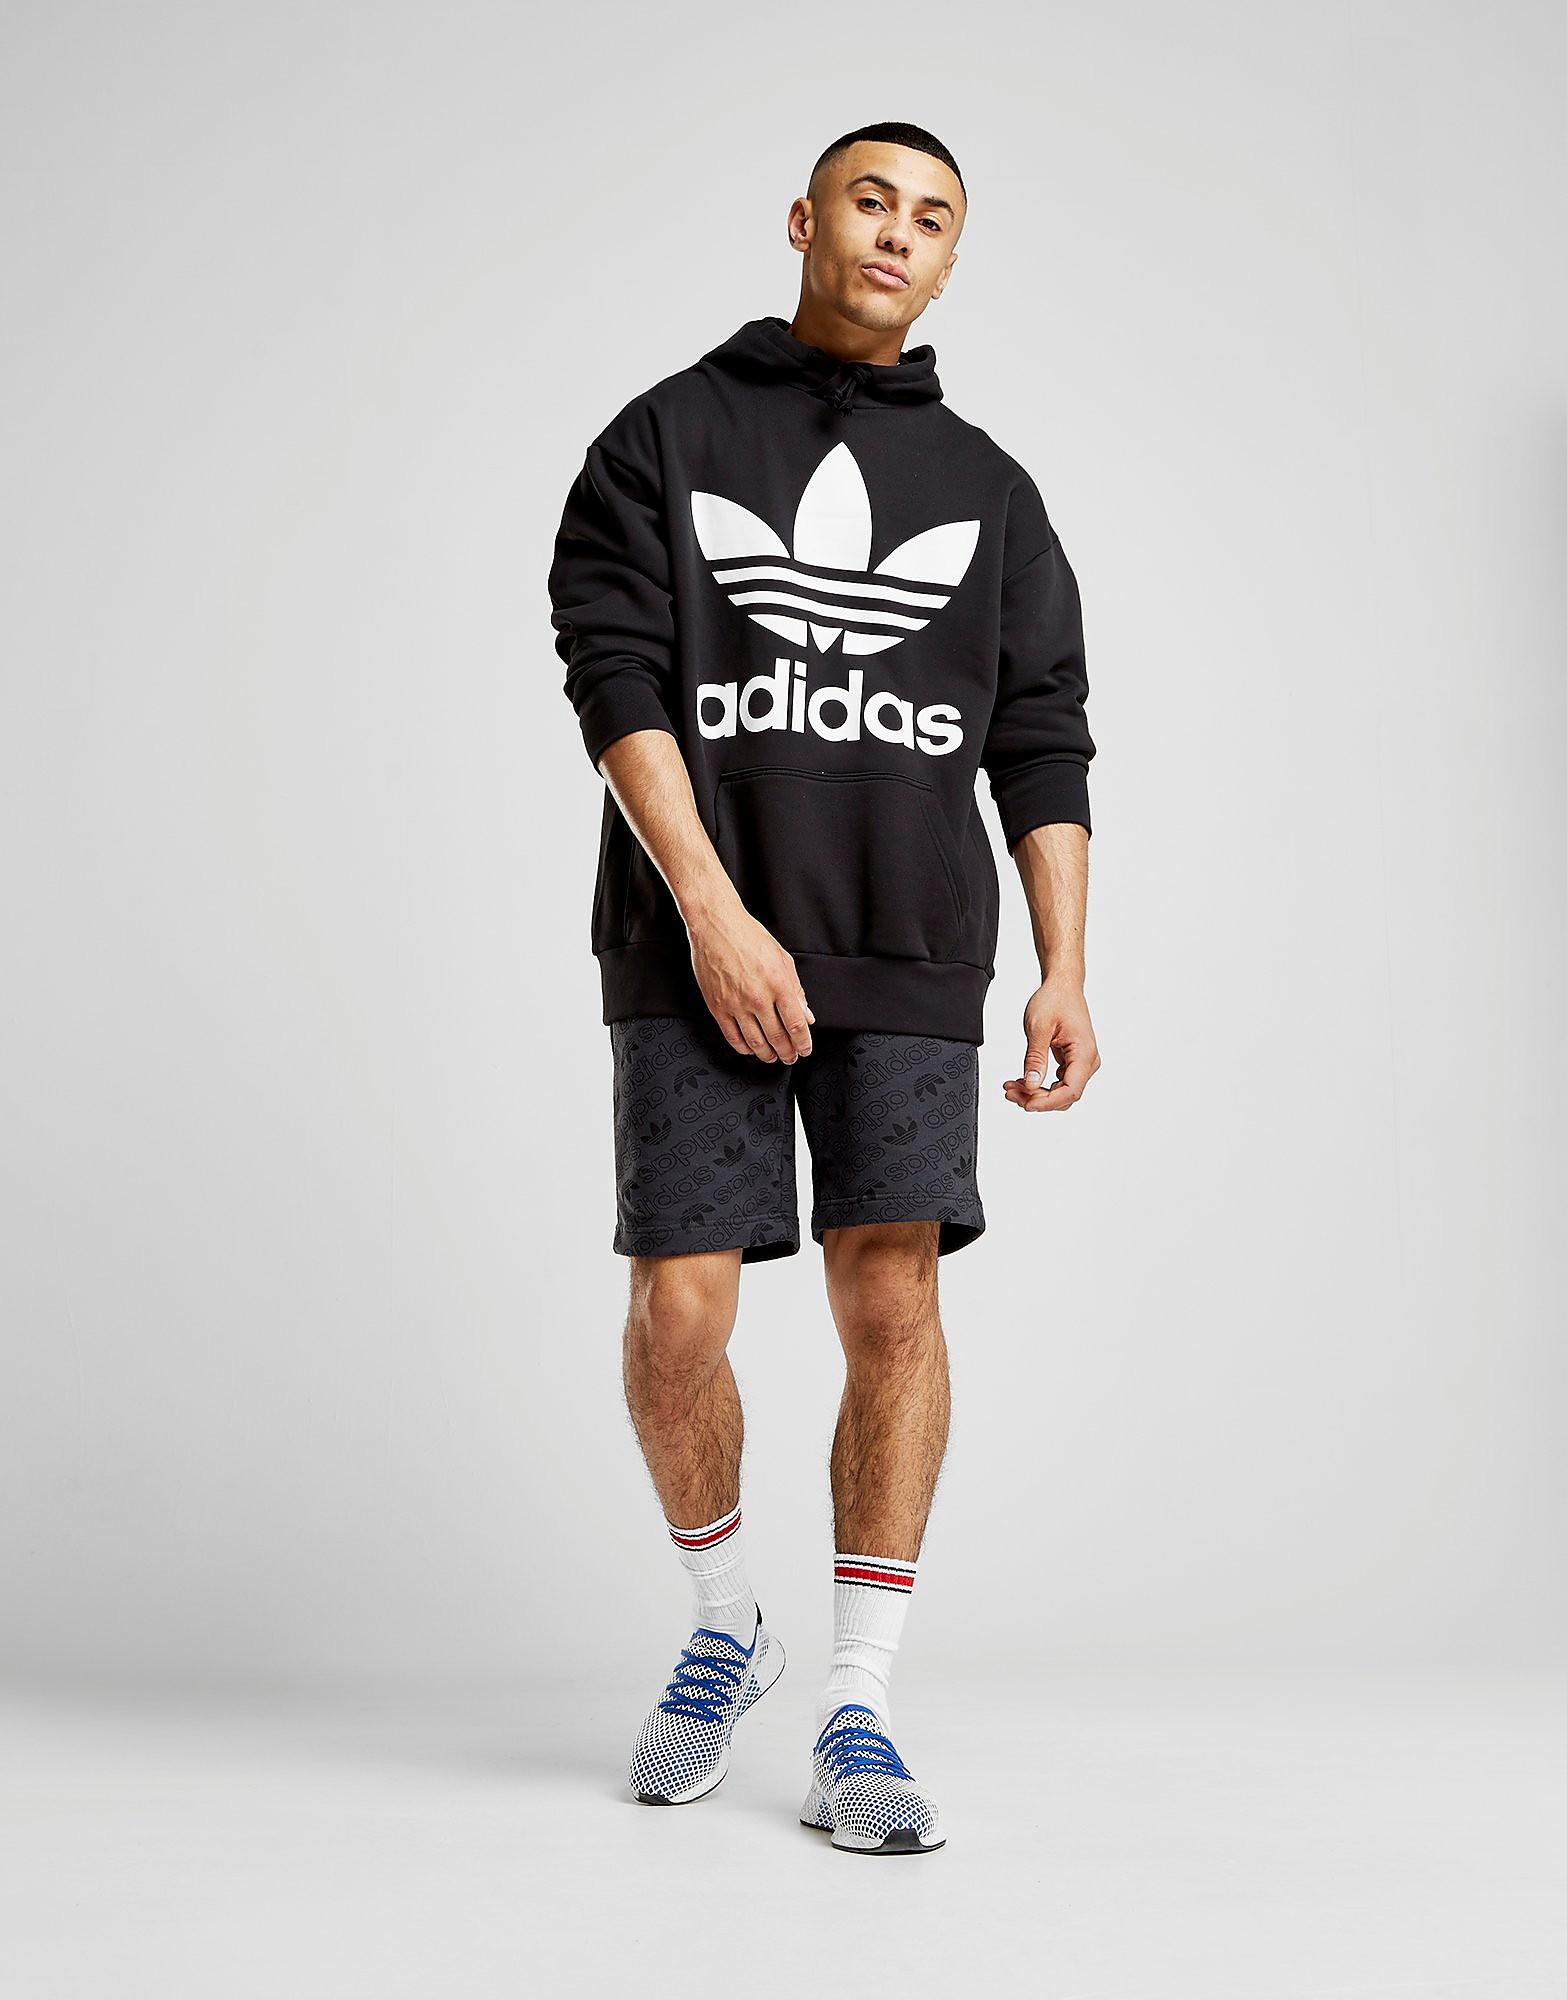 adidas Originals Trefoil Oversized Hoodie